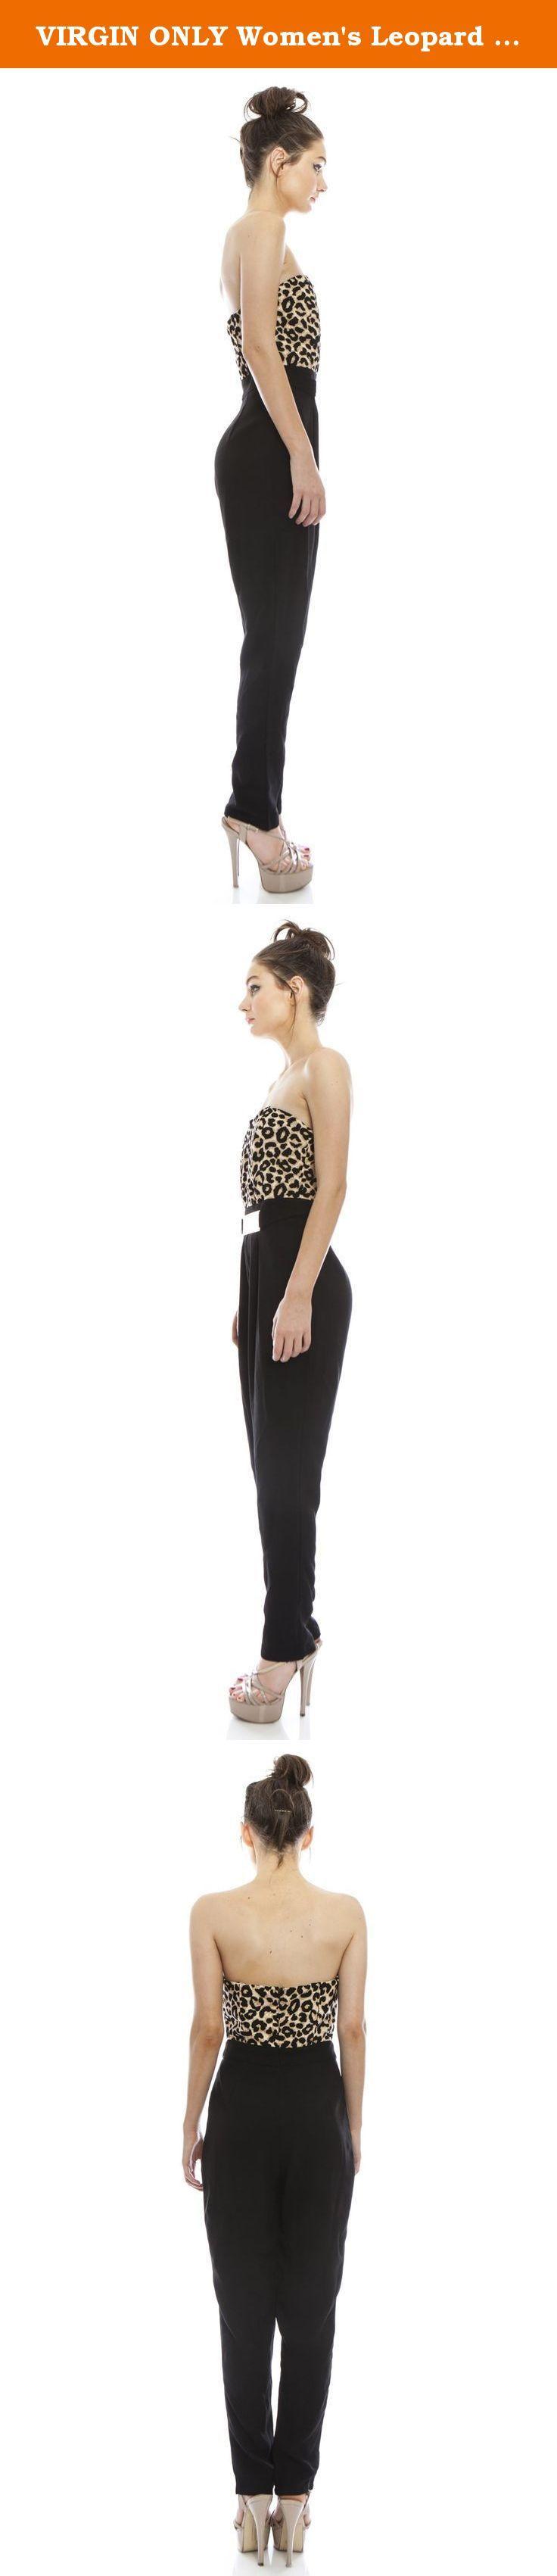 VIRGIN ONLY Women's Leopard Print Jumpsuit (Brown, Medium). Animal print jumpsuit embellished with removable belt.